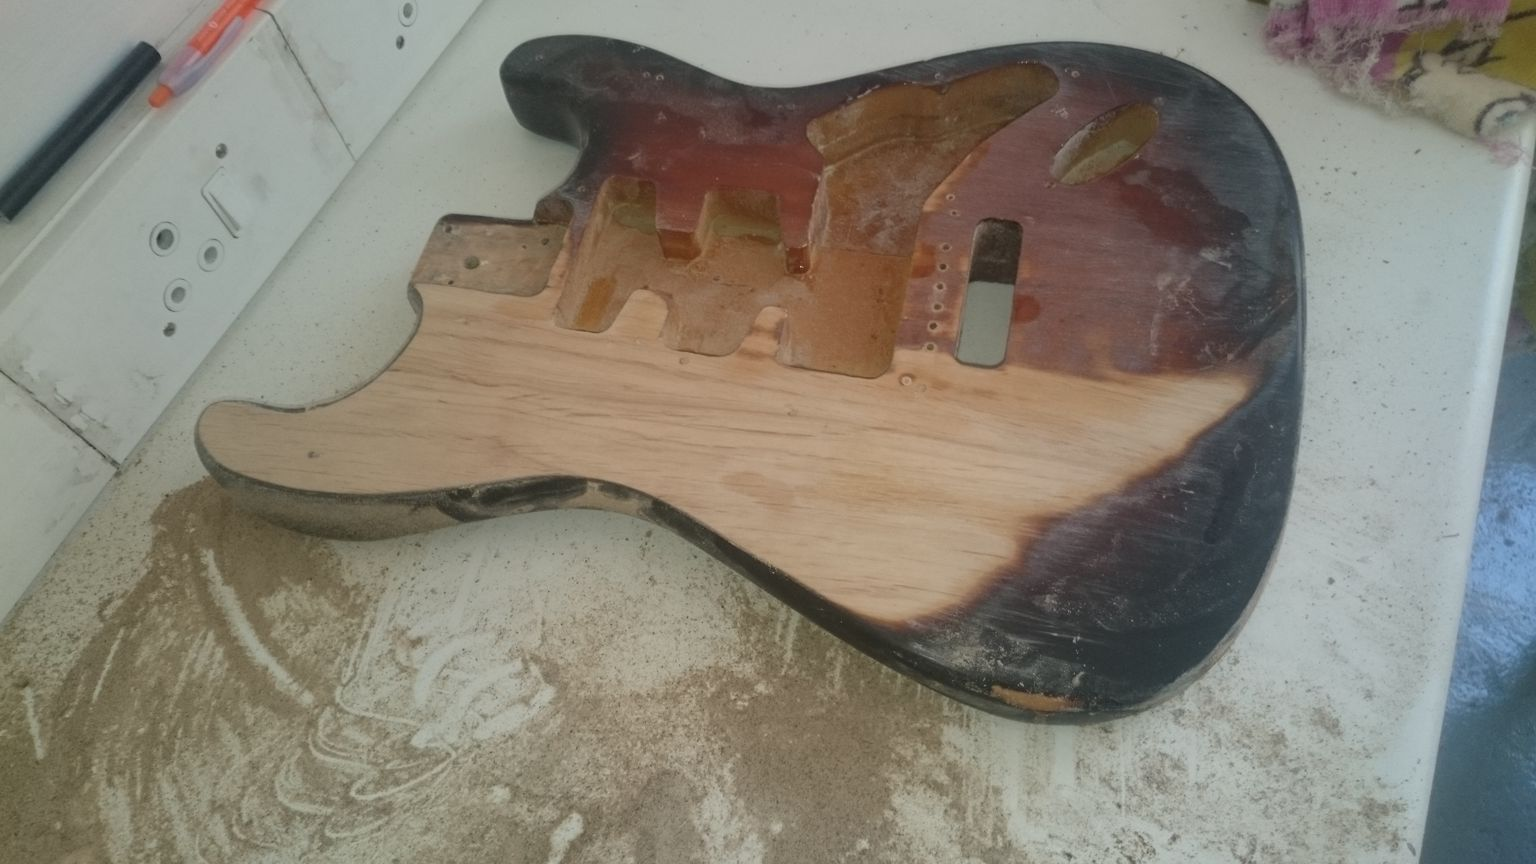 My first guitar re-build: Stratocaster - GuitarTalk Community